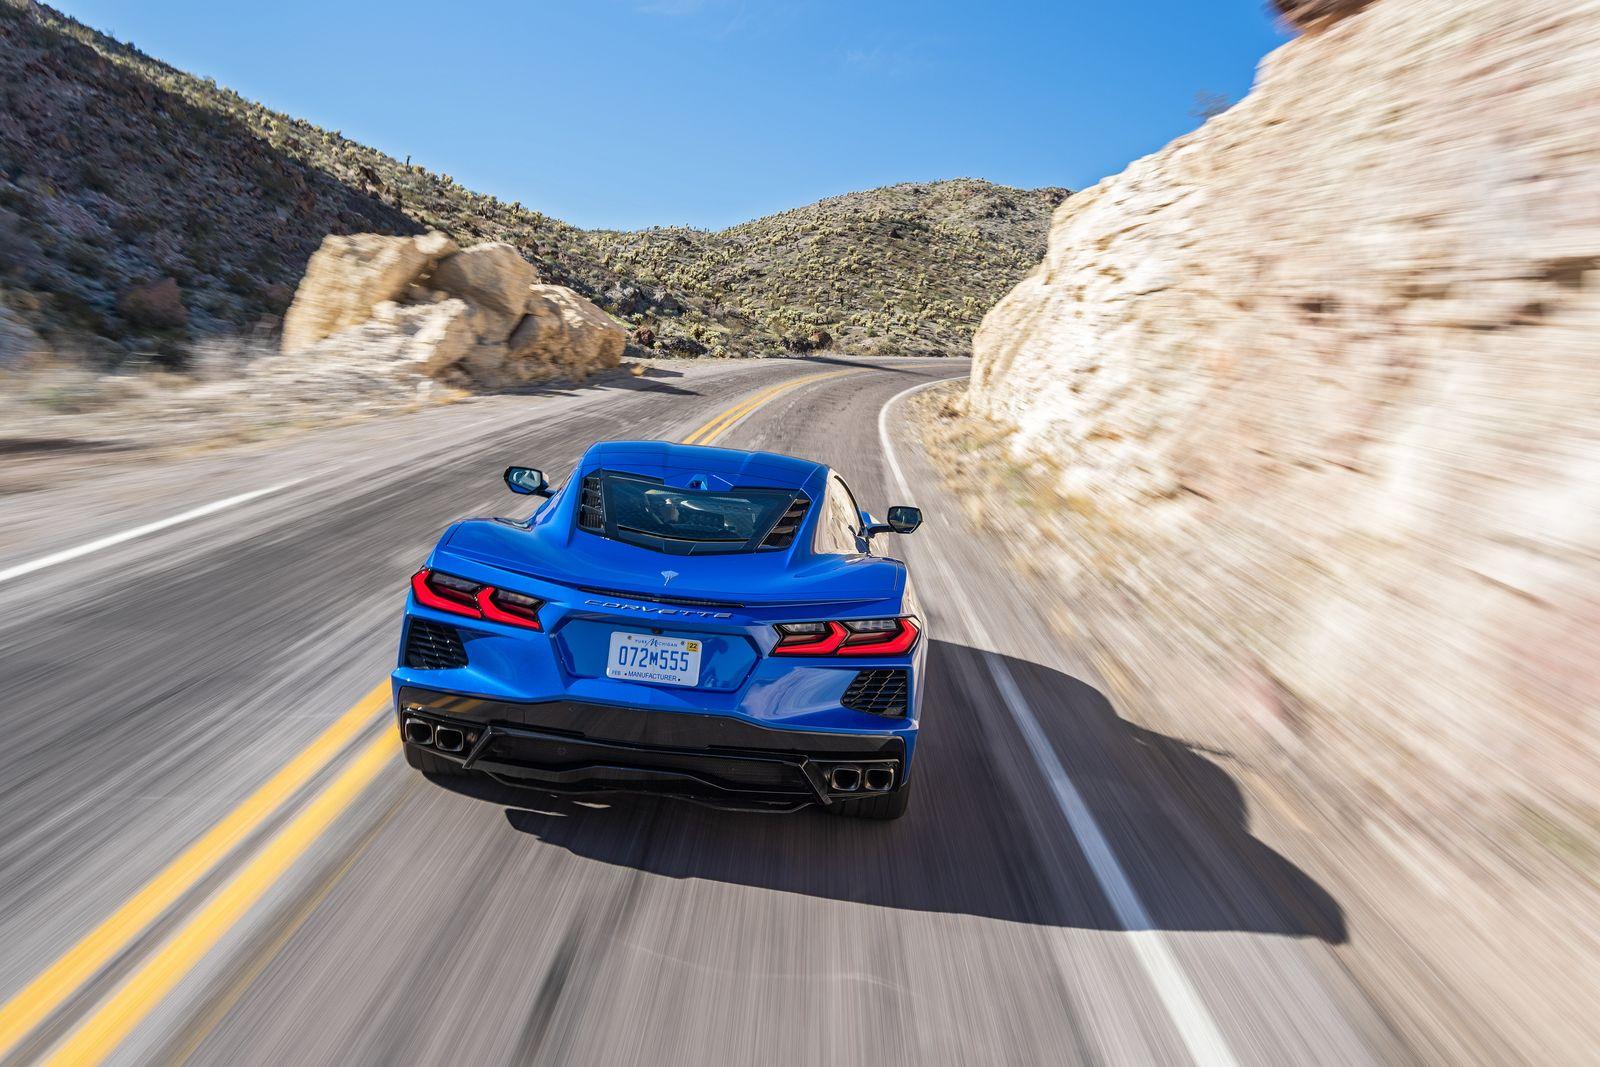 2020-Corvette-D55_9794